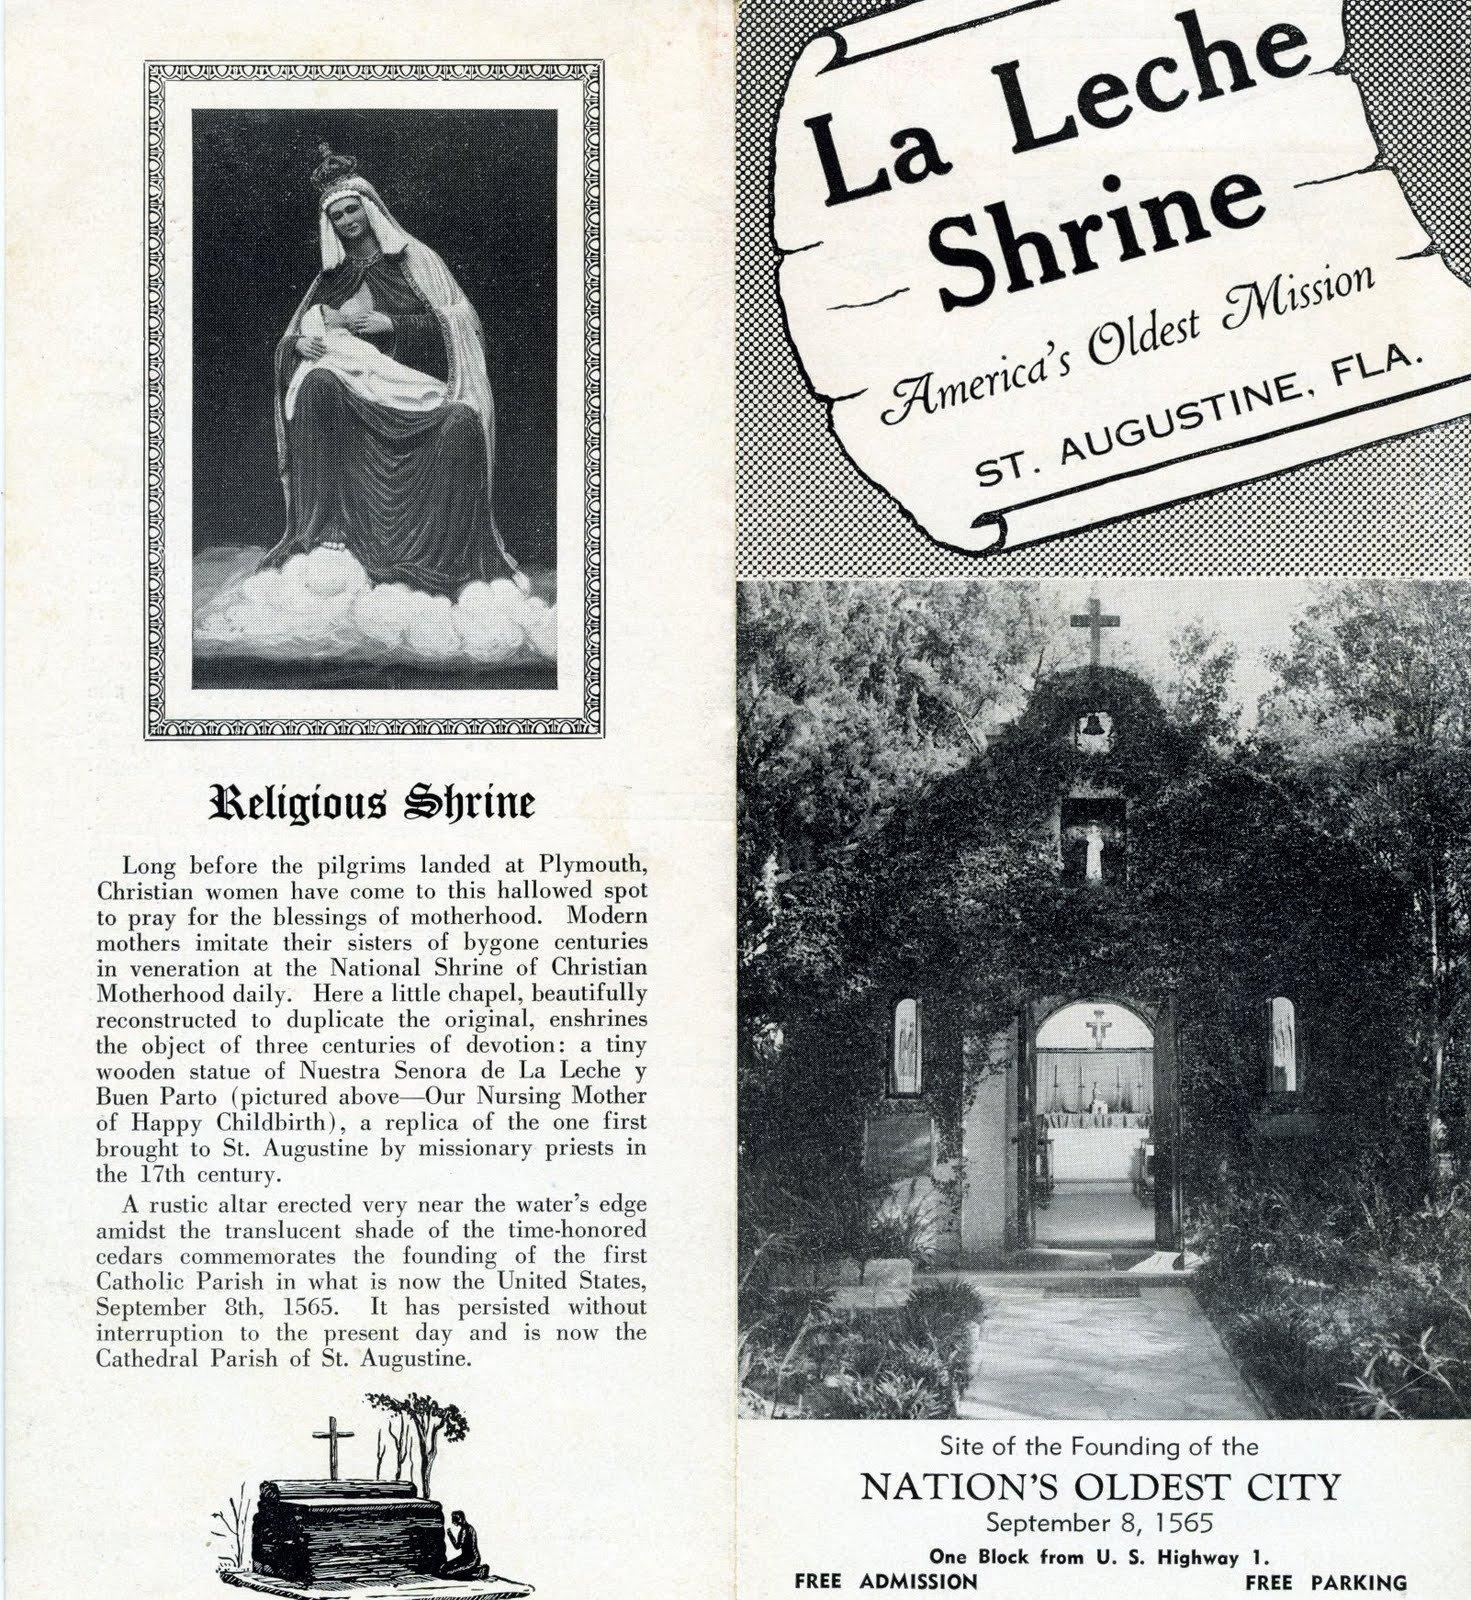 La Leche Shrine: America's Oldest Mission